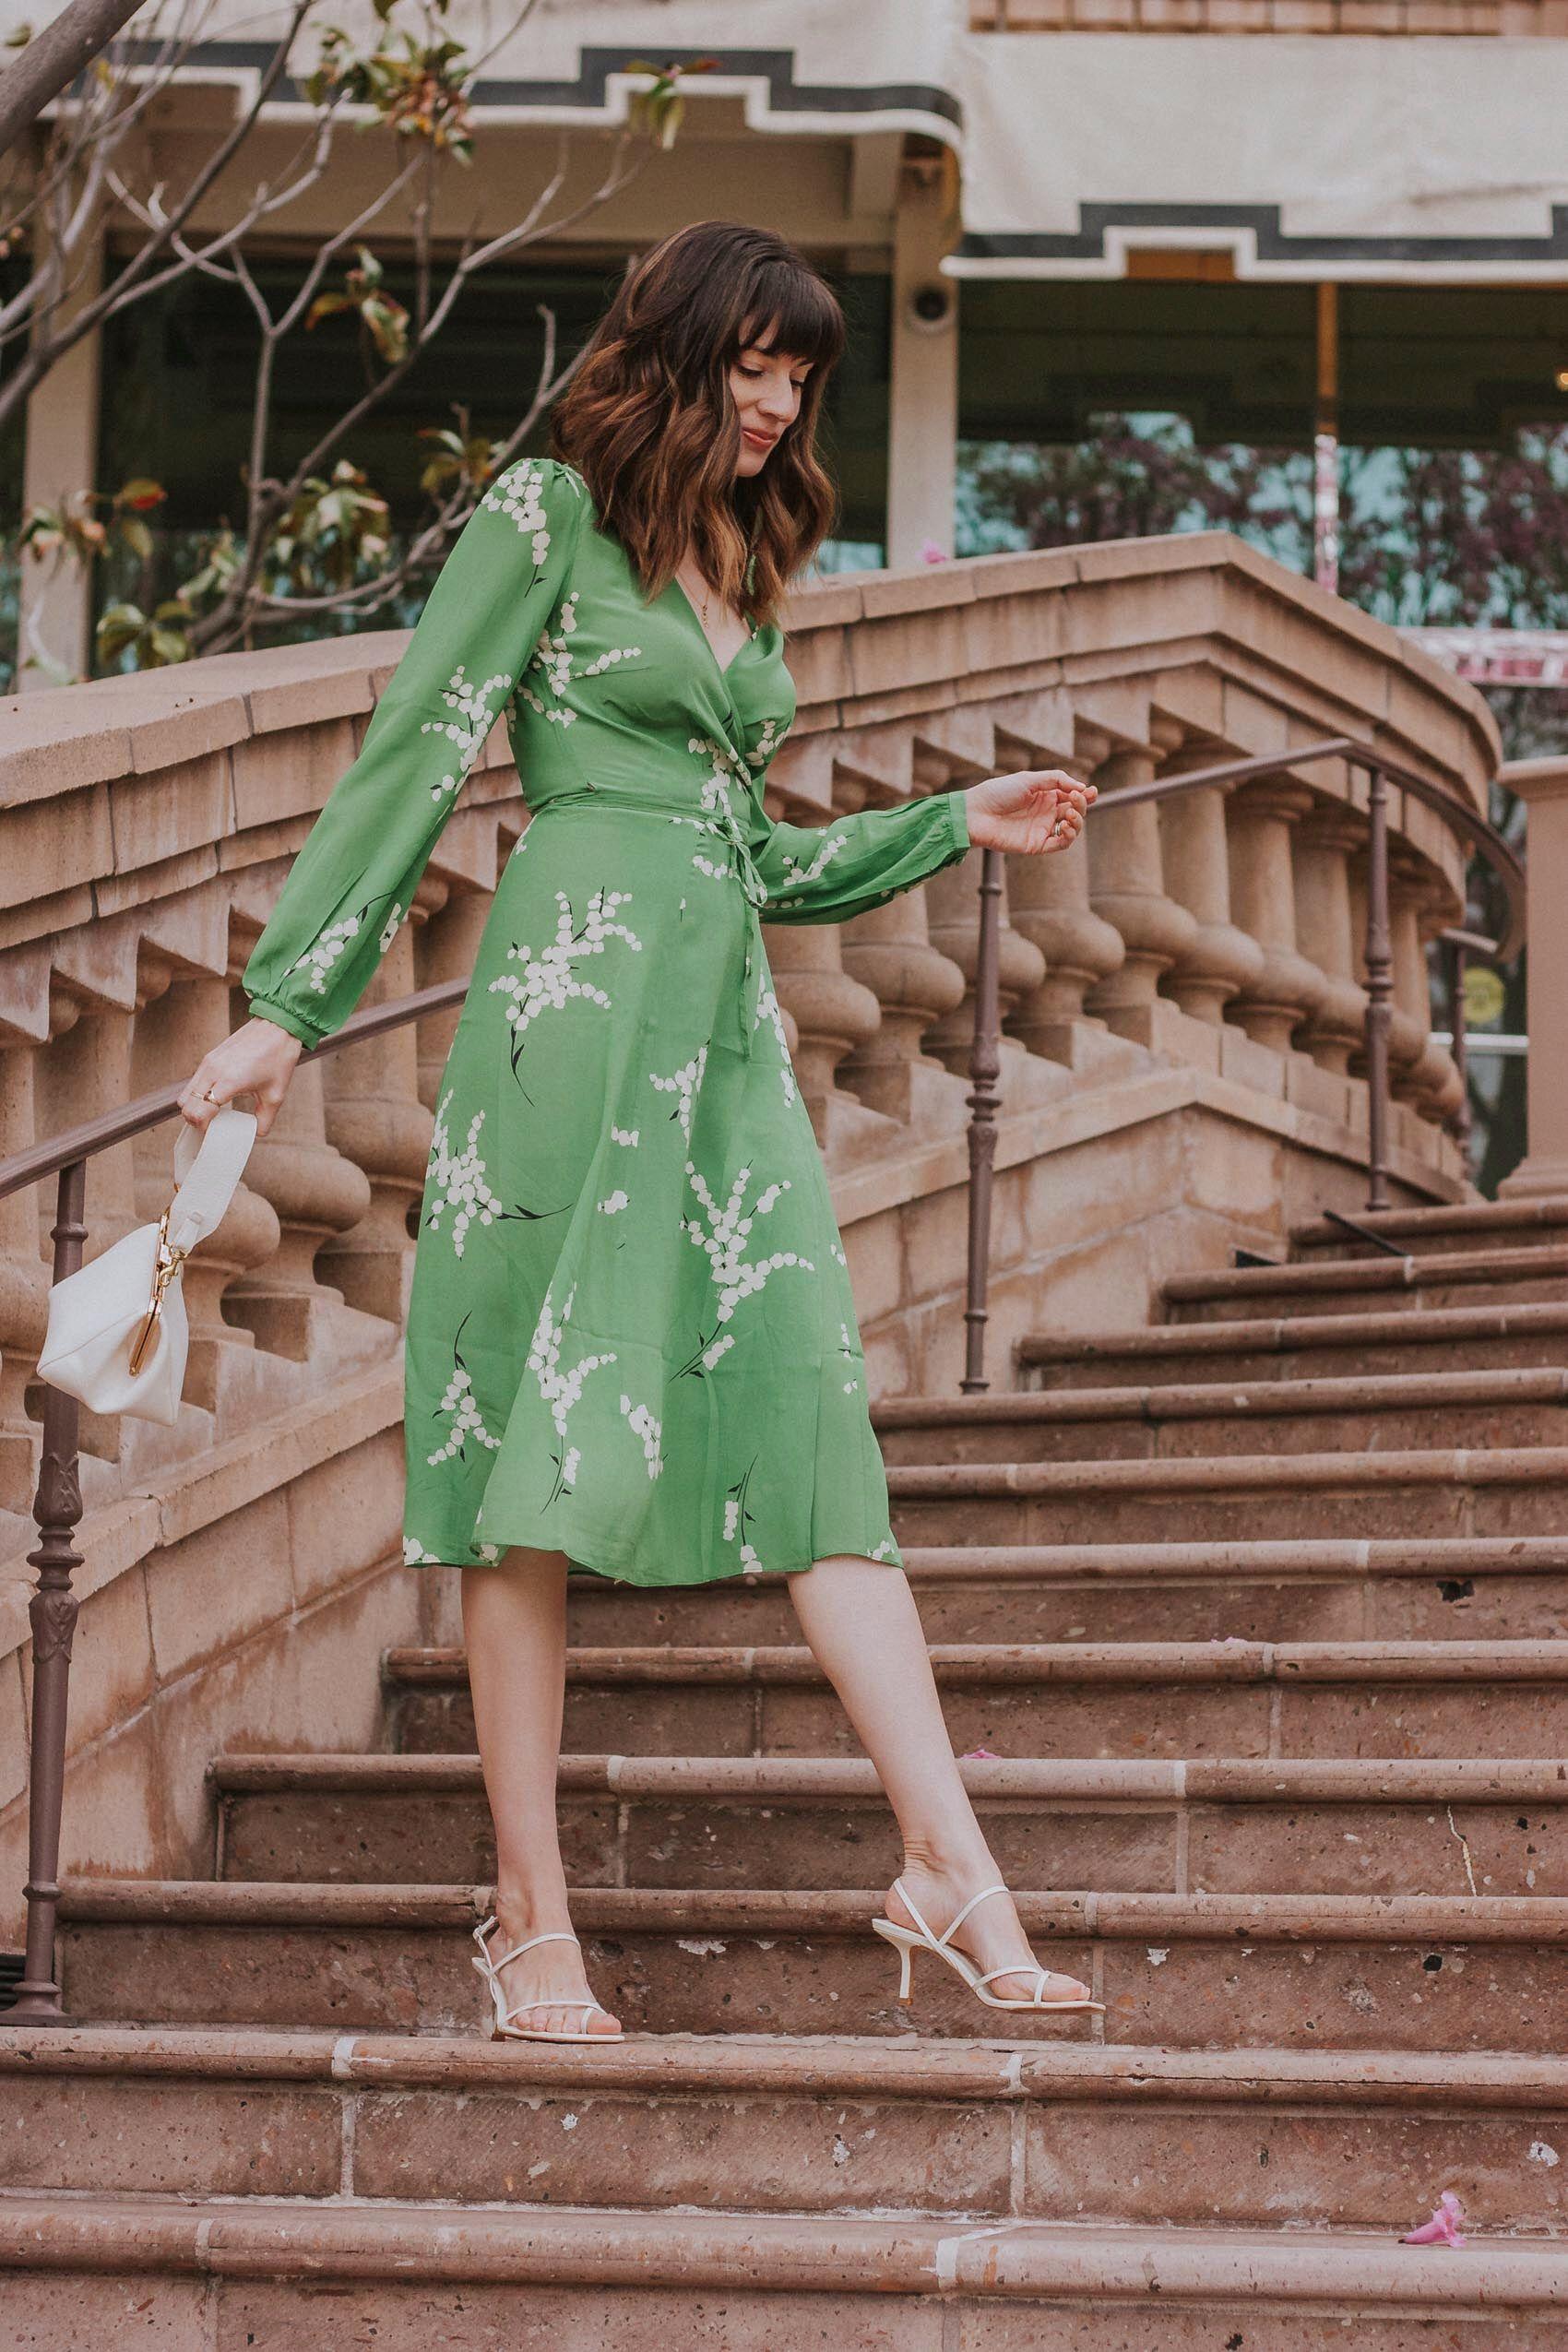 Realisation Par Midi Dress Jeans And A Teacup Summer Date Night Dress Midi Dress Night Outfits [ 2550 x 1700 Pixel ]